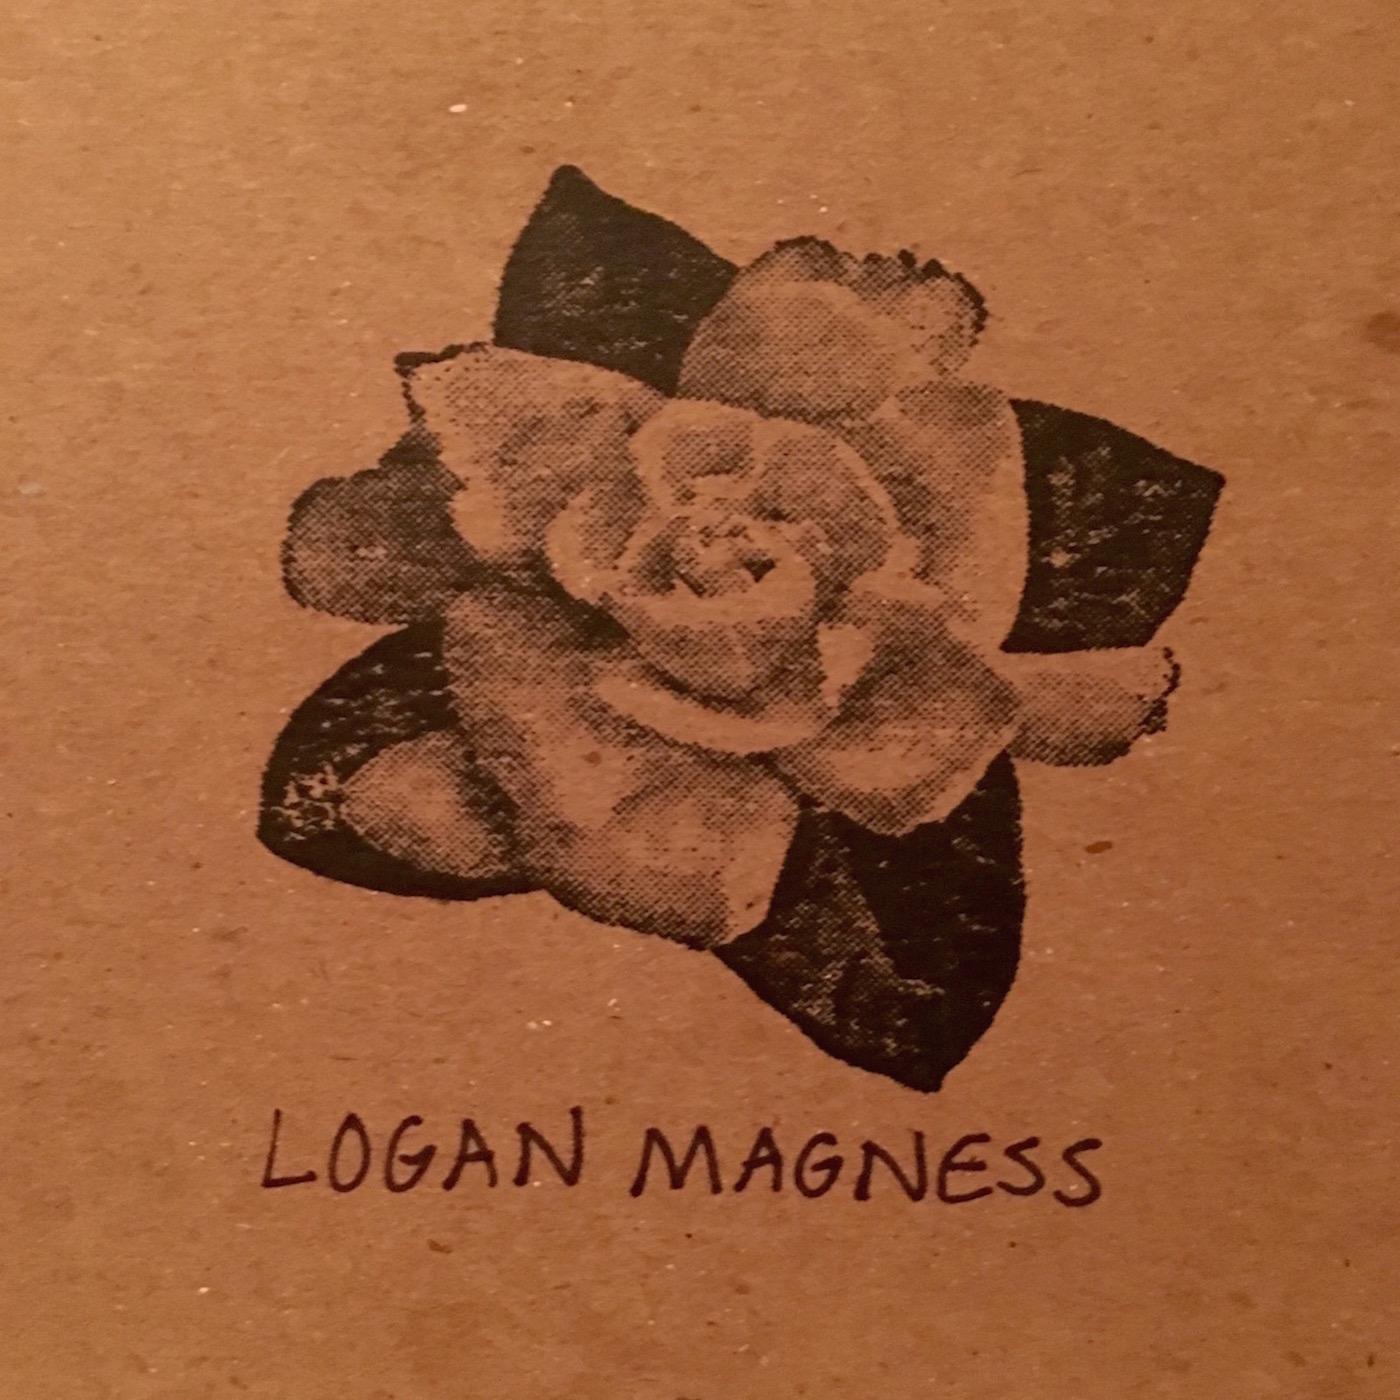 MAGNOLIA DEMOS - LOGAN MAGNESSMAGNOLIA DEMOS (EP)2016Melt Like WaxBed of NailsLornaThin Red LineiTunes // Bandcamp // Spotify // Amazon